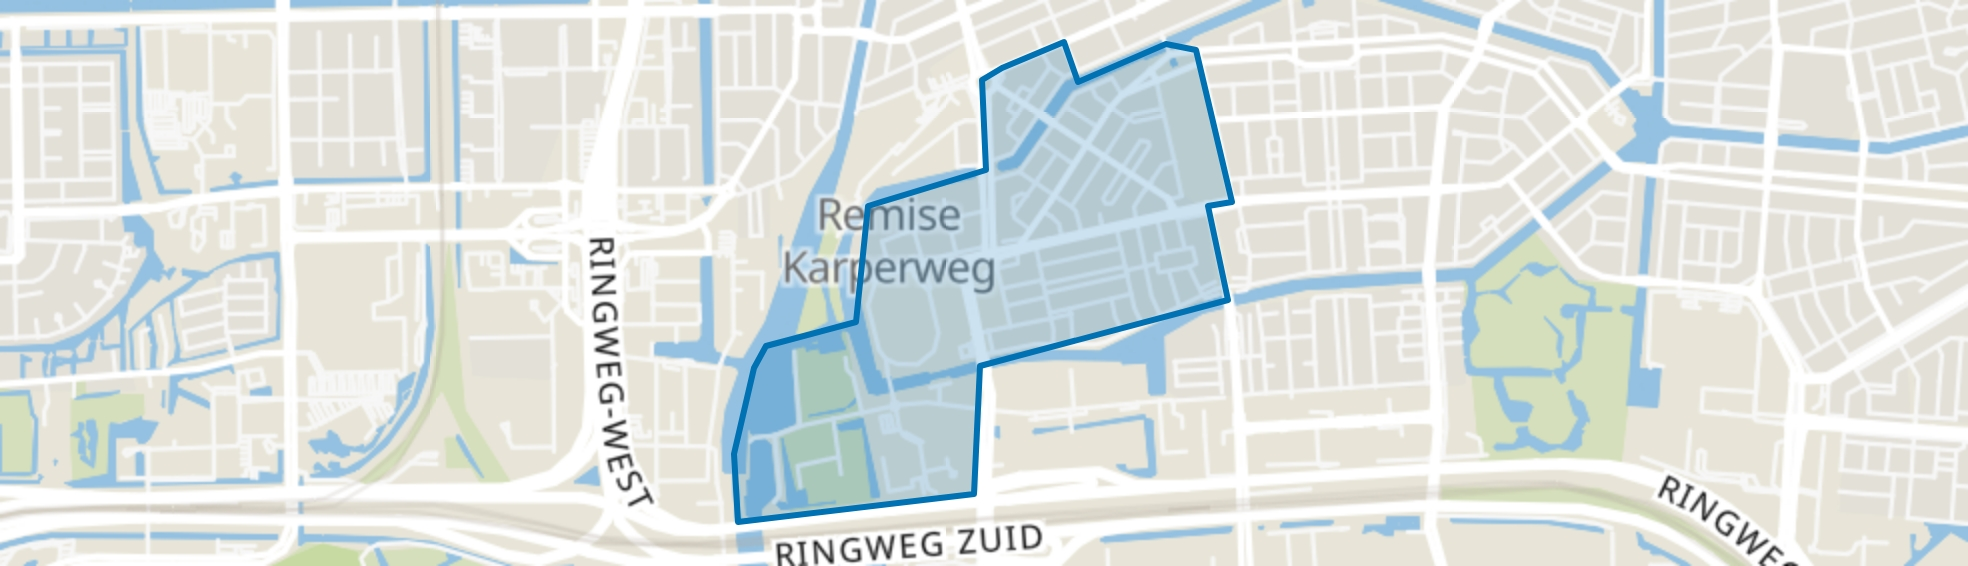 Stadionbuurt, Amsterdam map